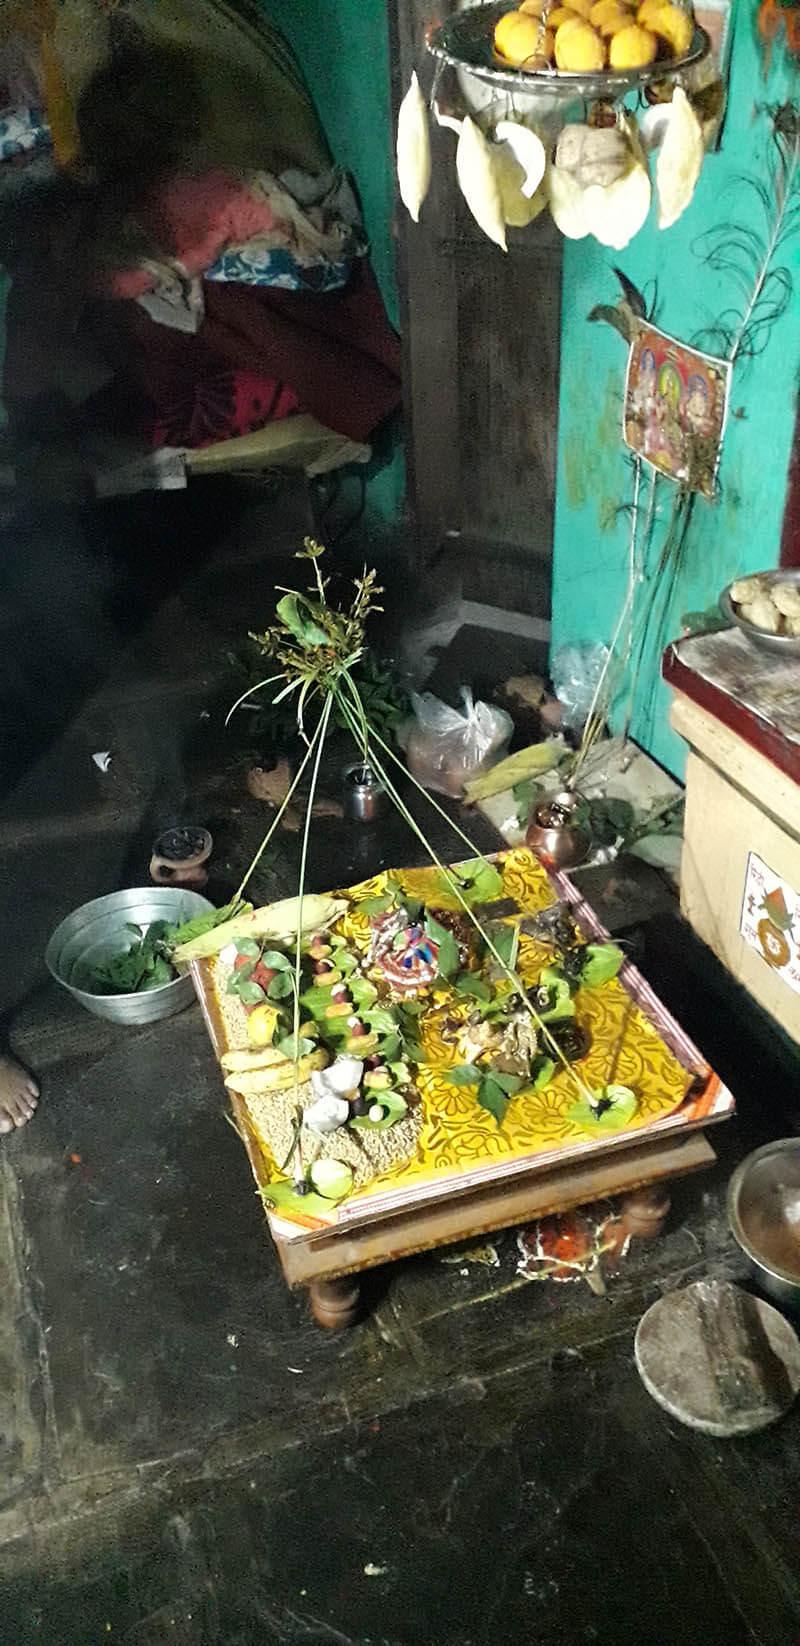 Lavhan grass worship